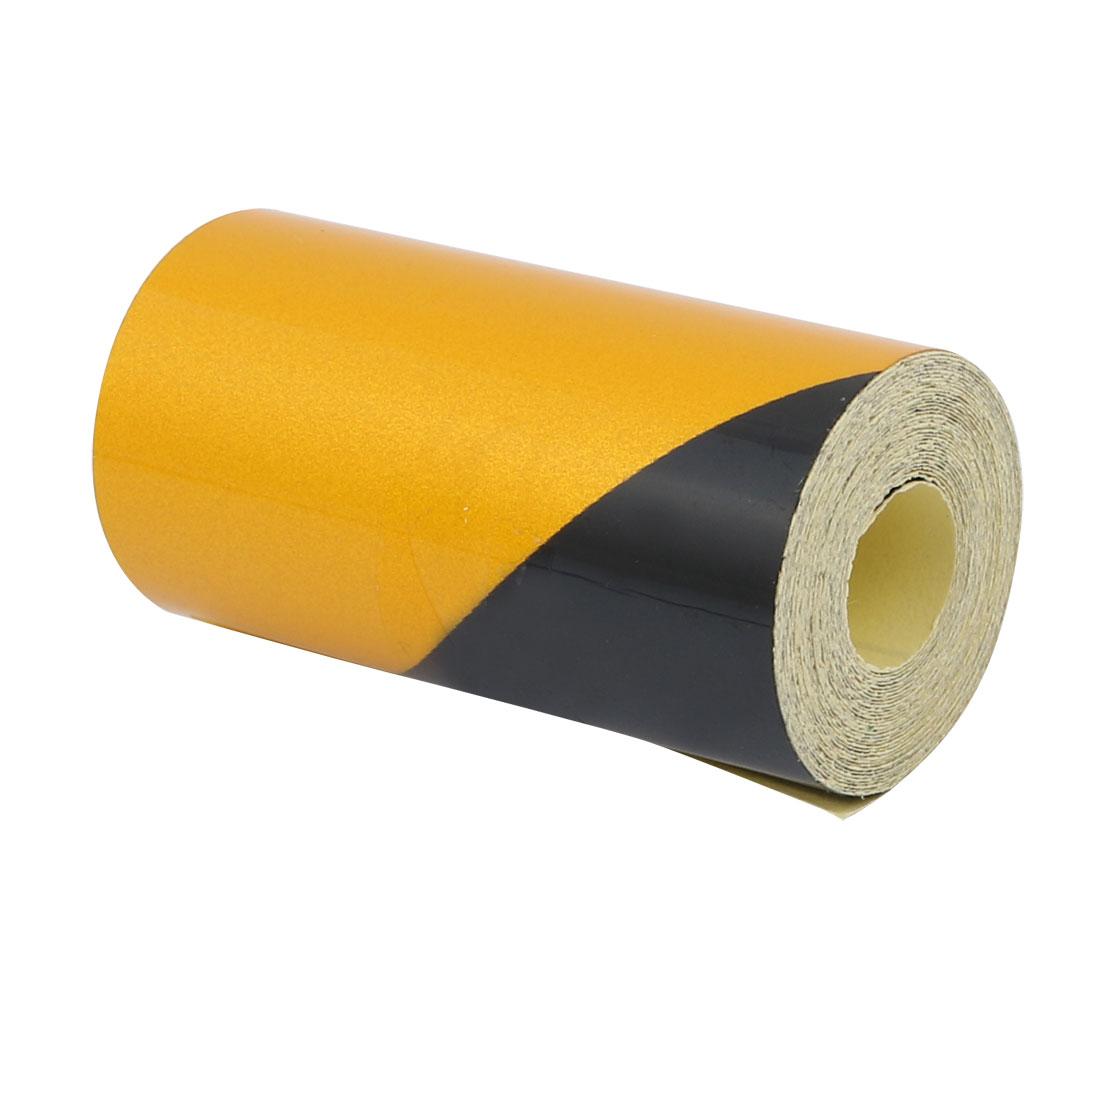 2M Length 5cm Width Single Sided Adhesive Reflective Warning Tape Yellow Black